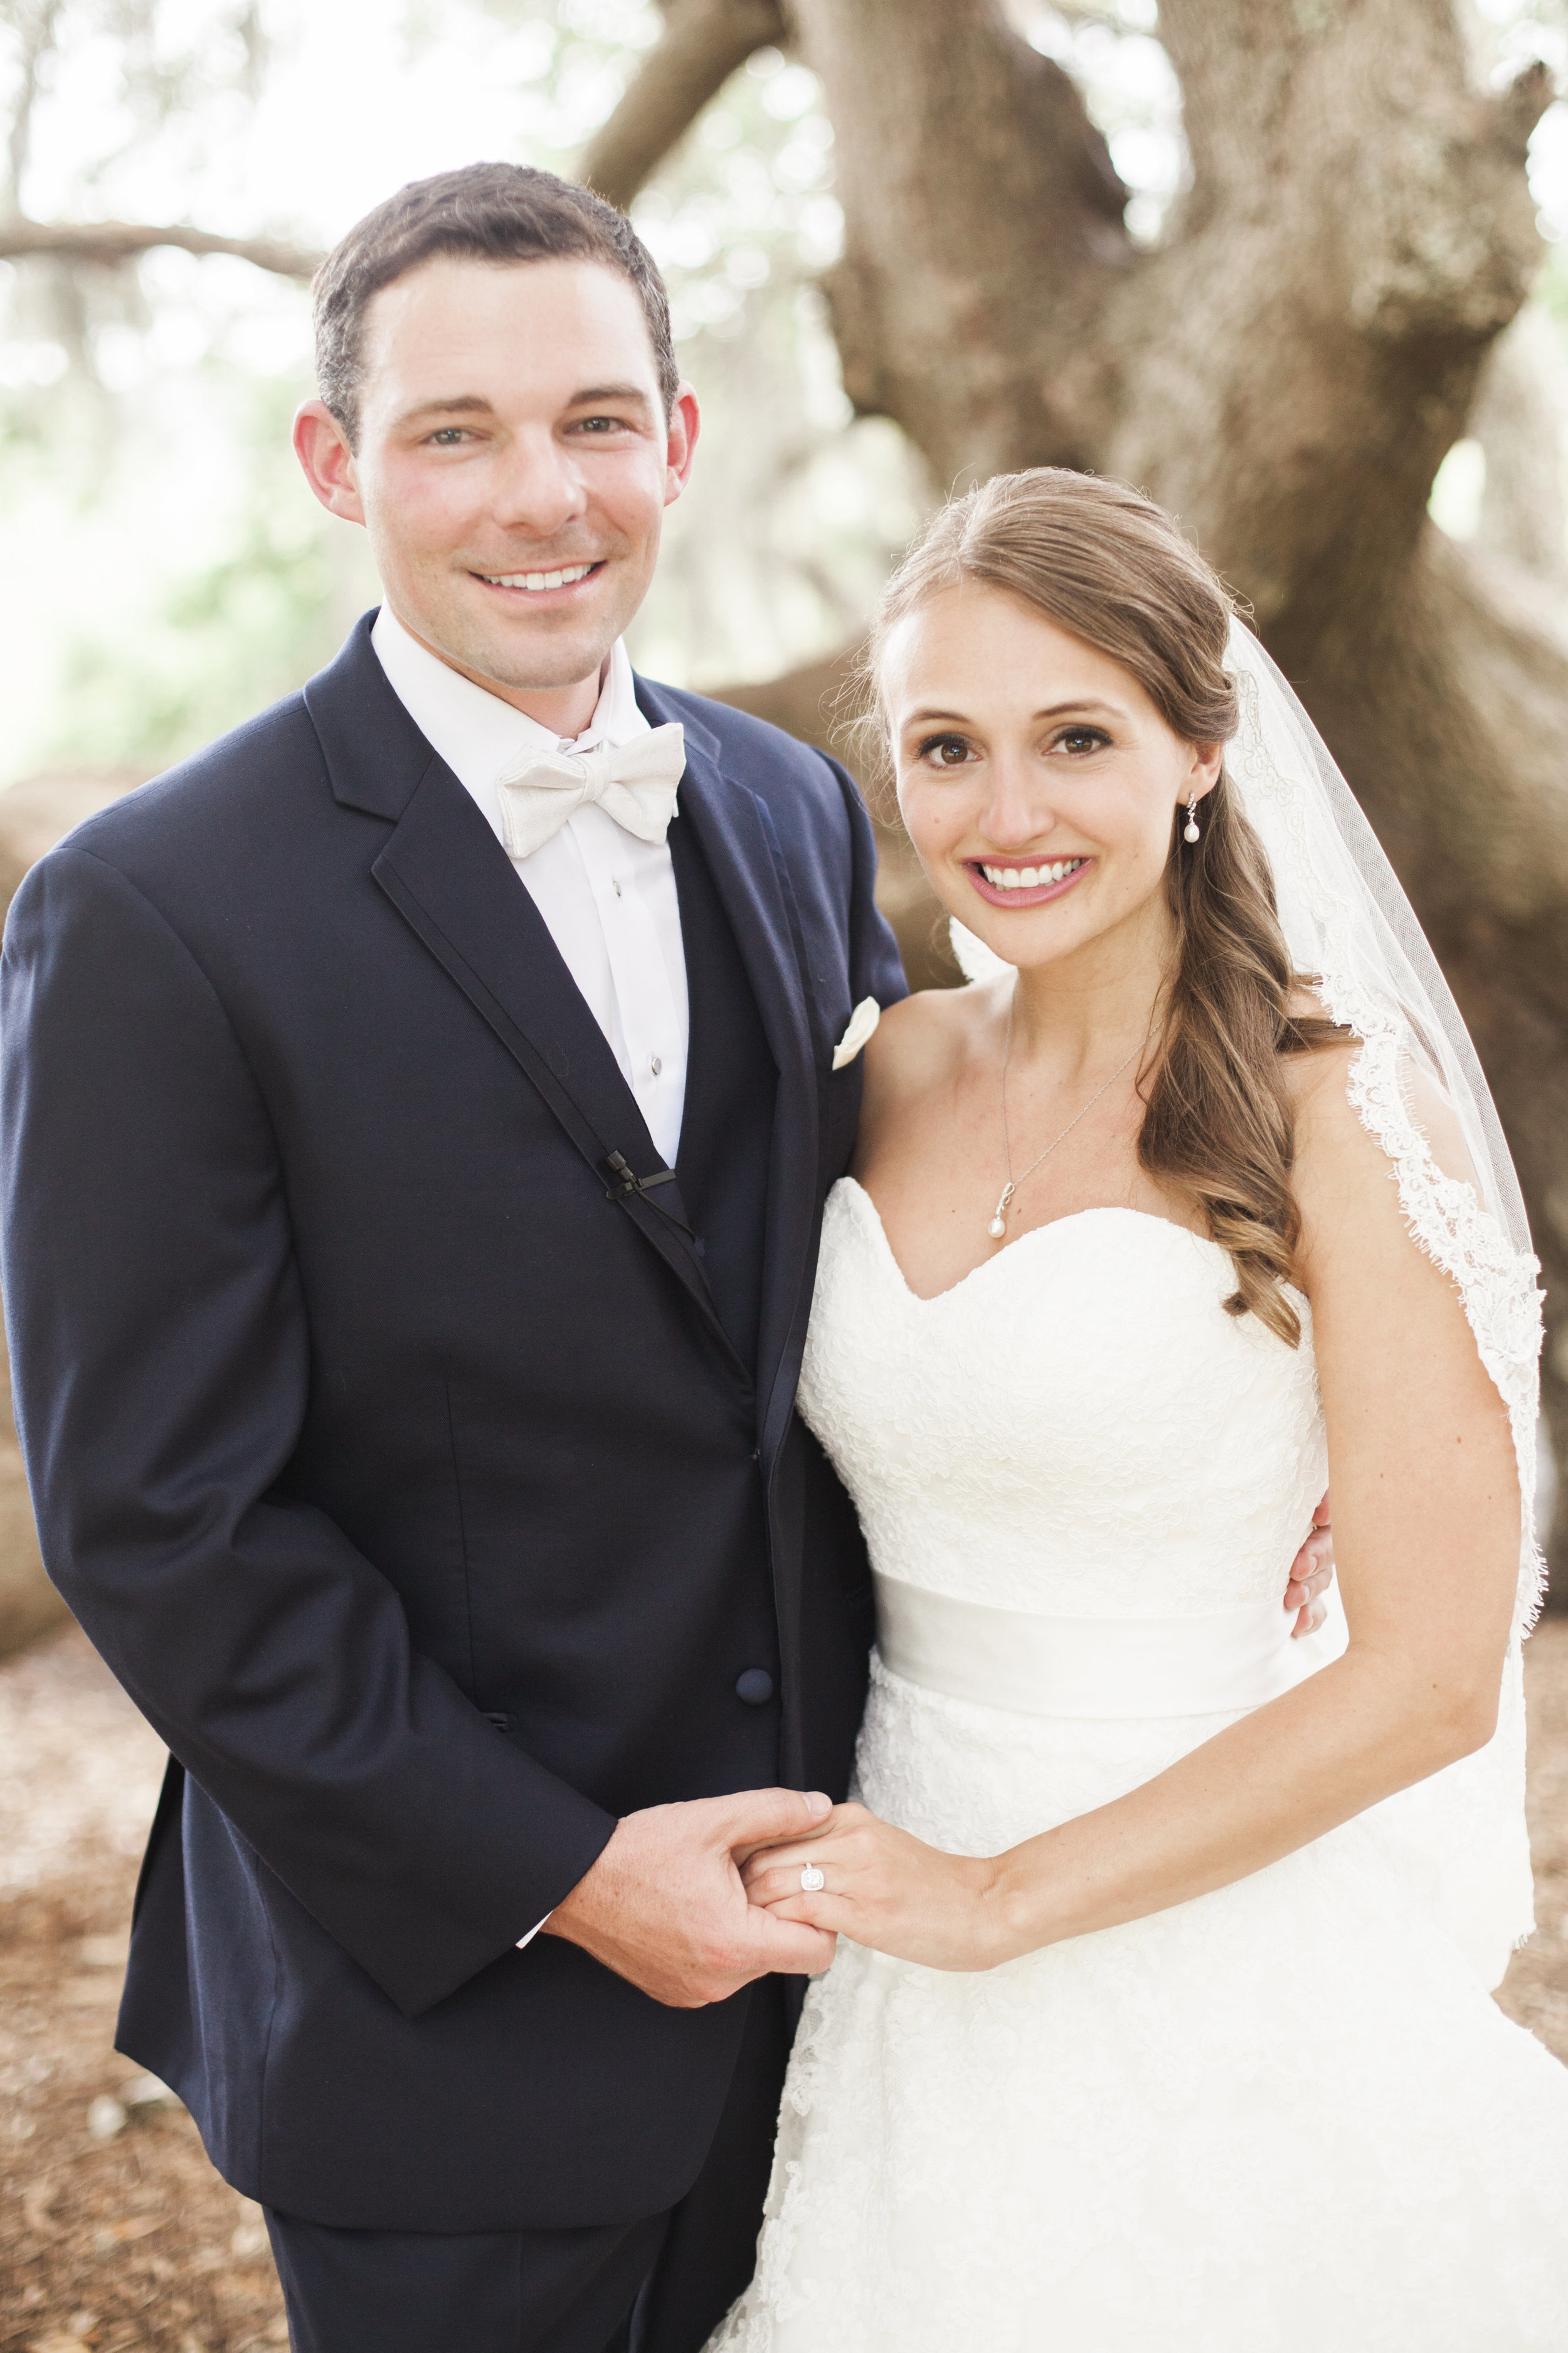 Amy + Jonathan's Boone Hall Plantation wedding in Charleston, SC by Jarrad Lister Photography